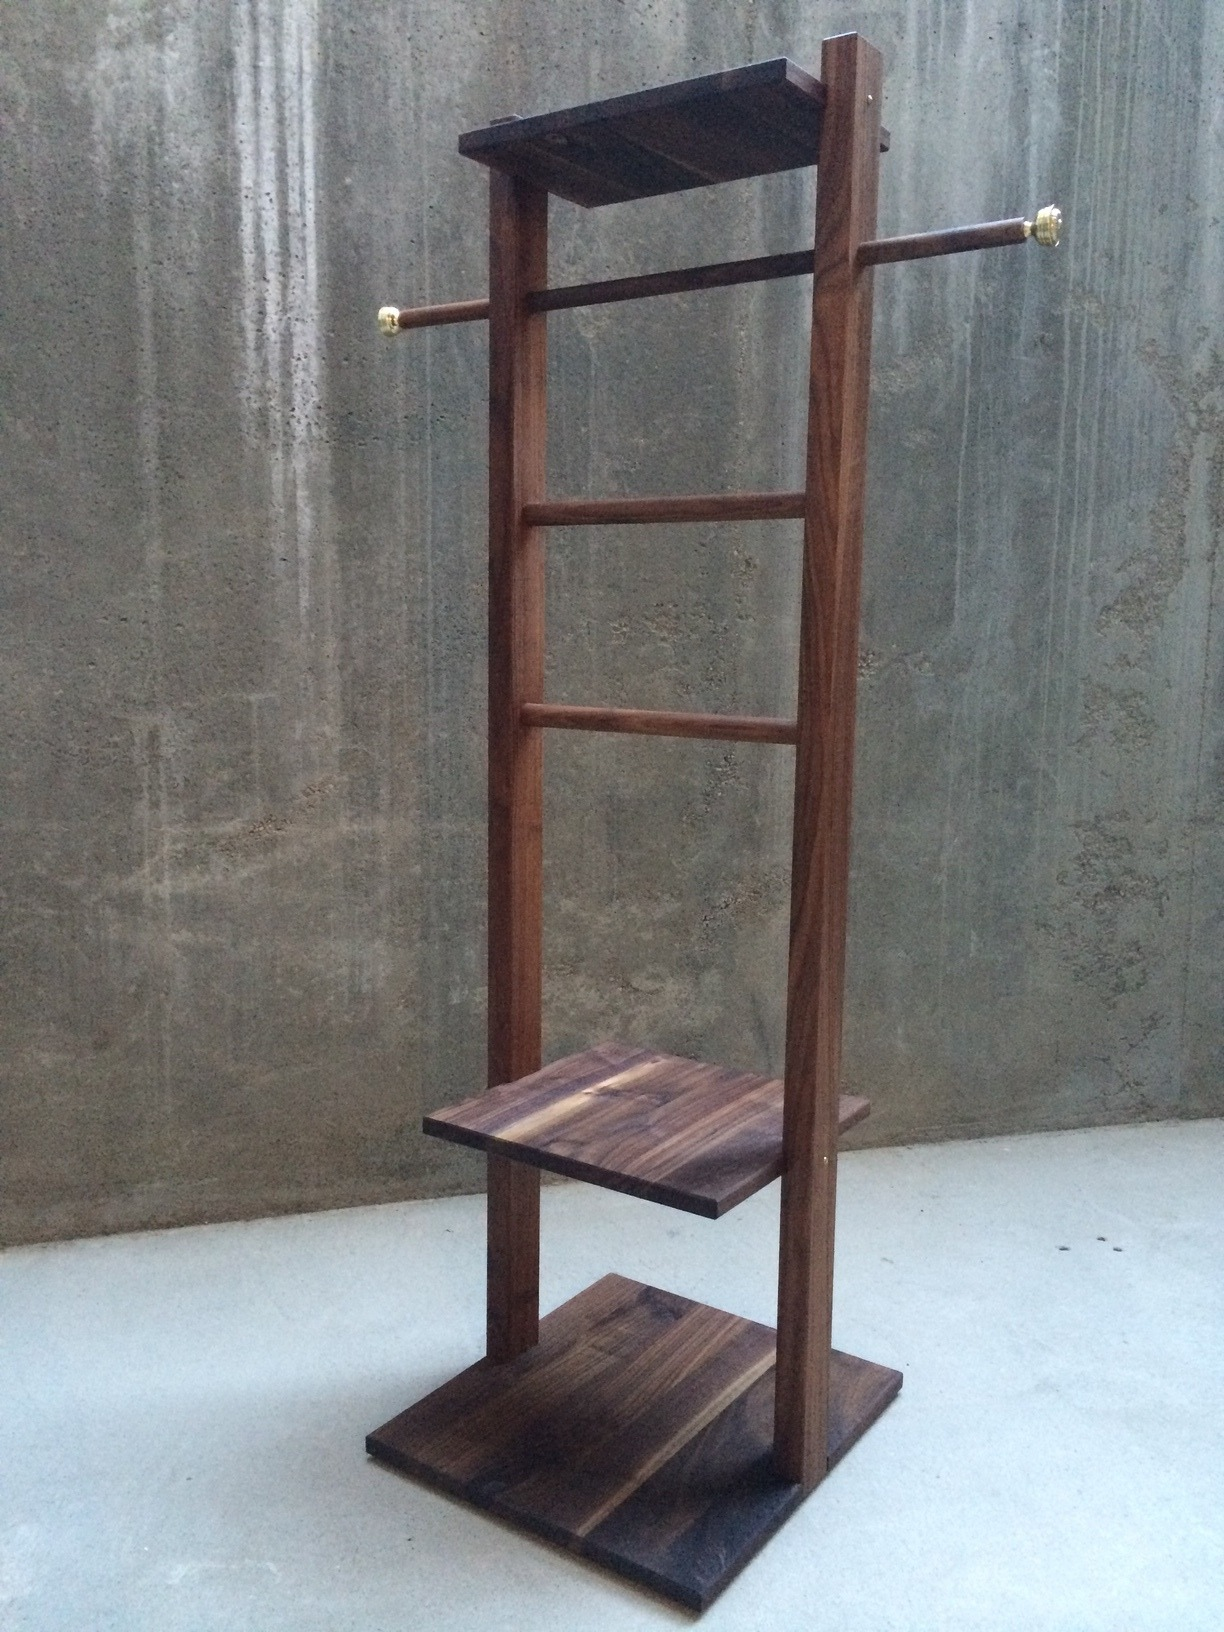 tb 1 stummer diener herren diener kleiderst nder tidyboy berlin. Black Bedroom Furniture Sets. Home Design Ideas